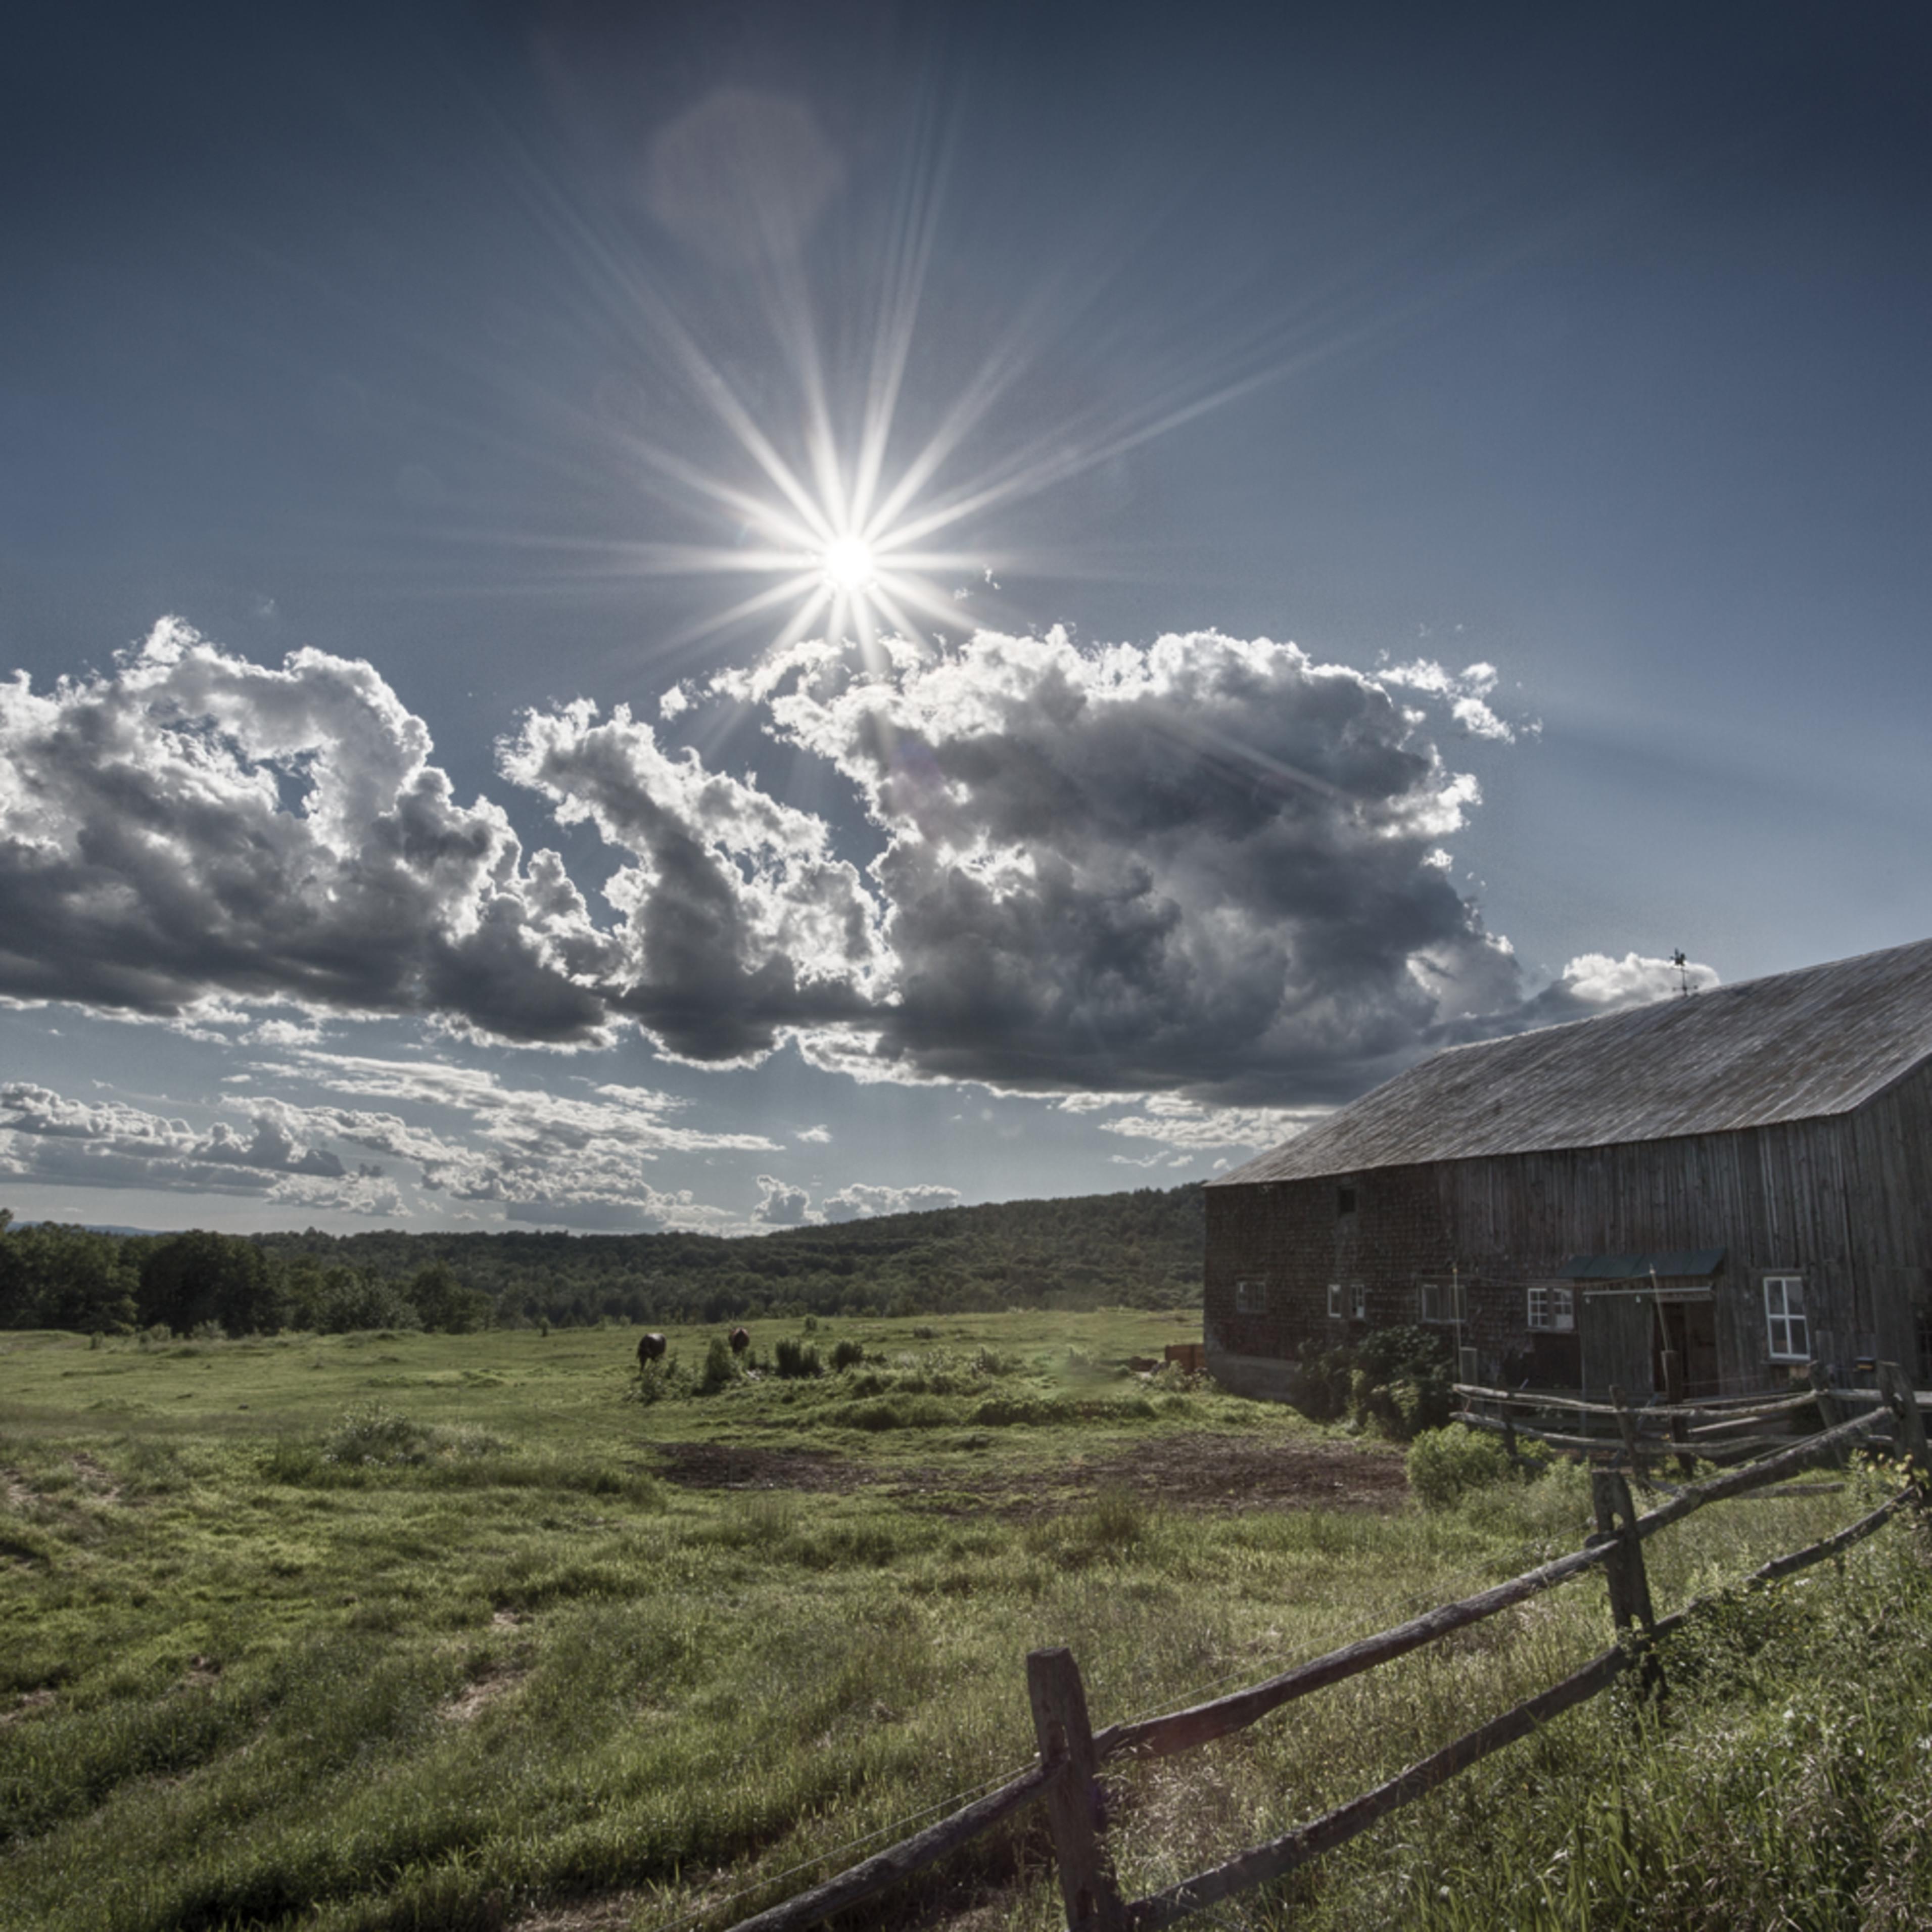 Summer sun rays on the barn sug32c